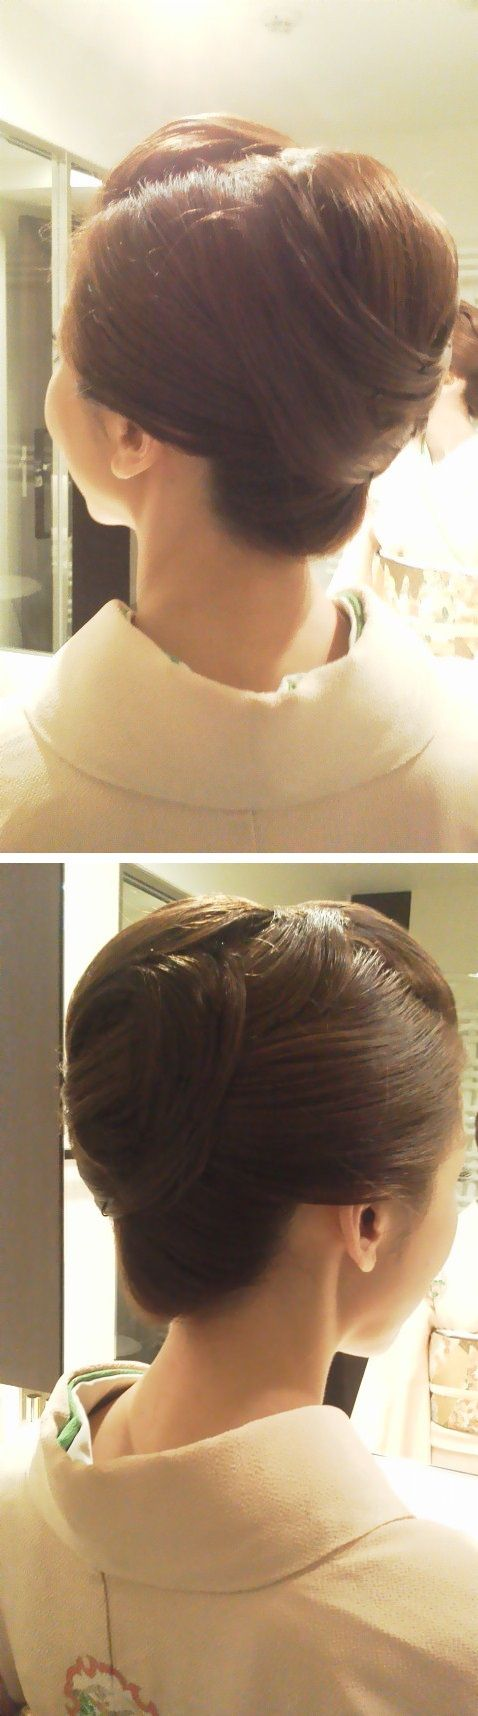 Kimono hairstyle: 着物 ヘアスタイル